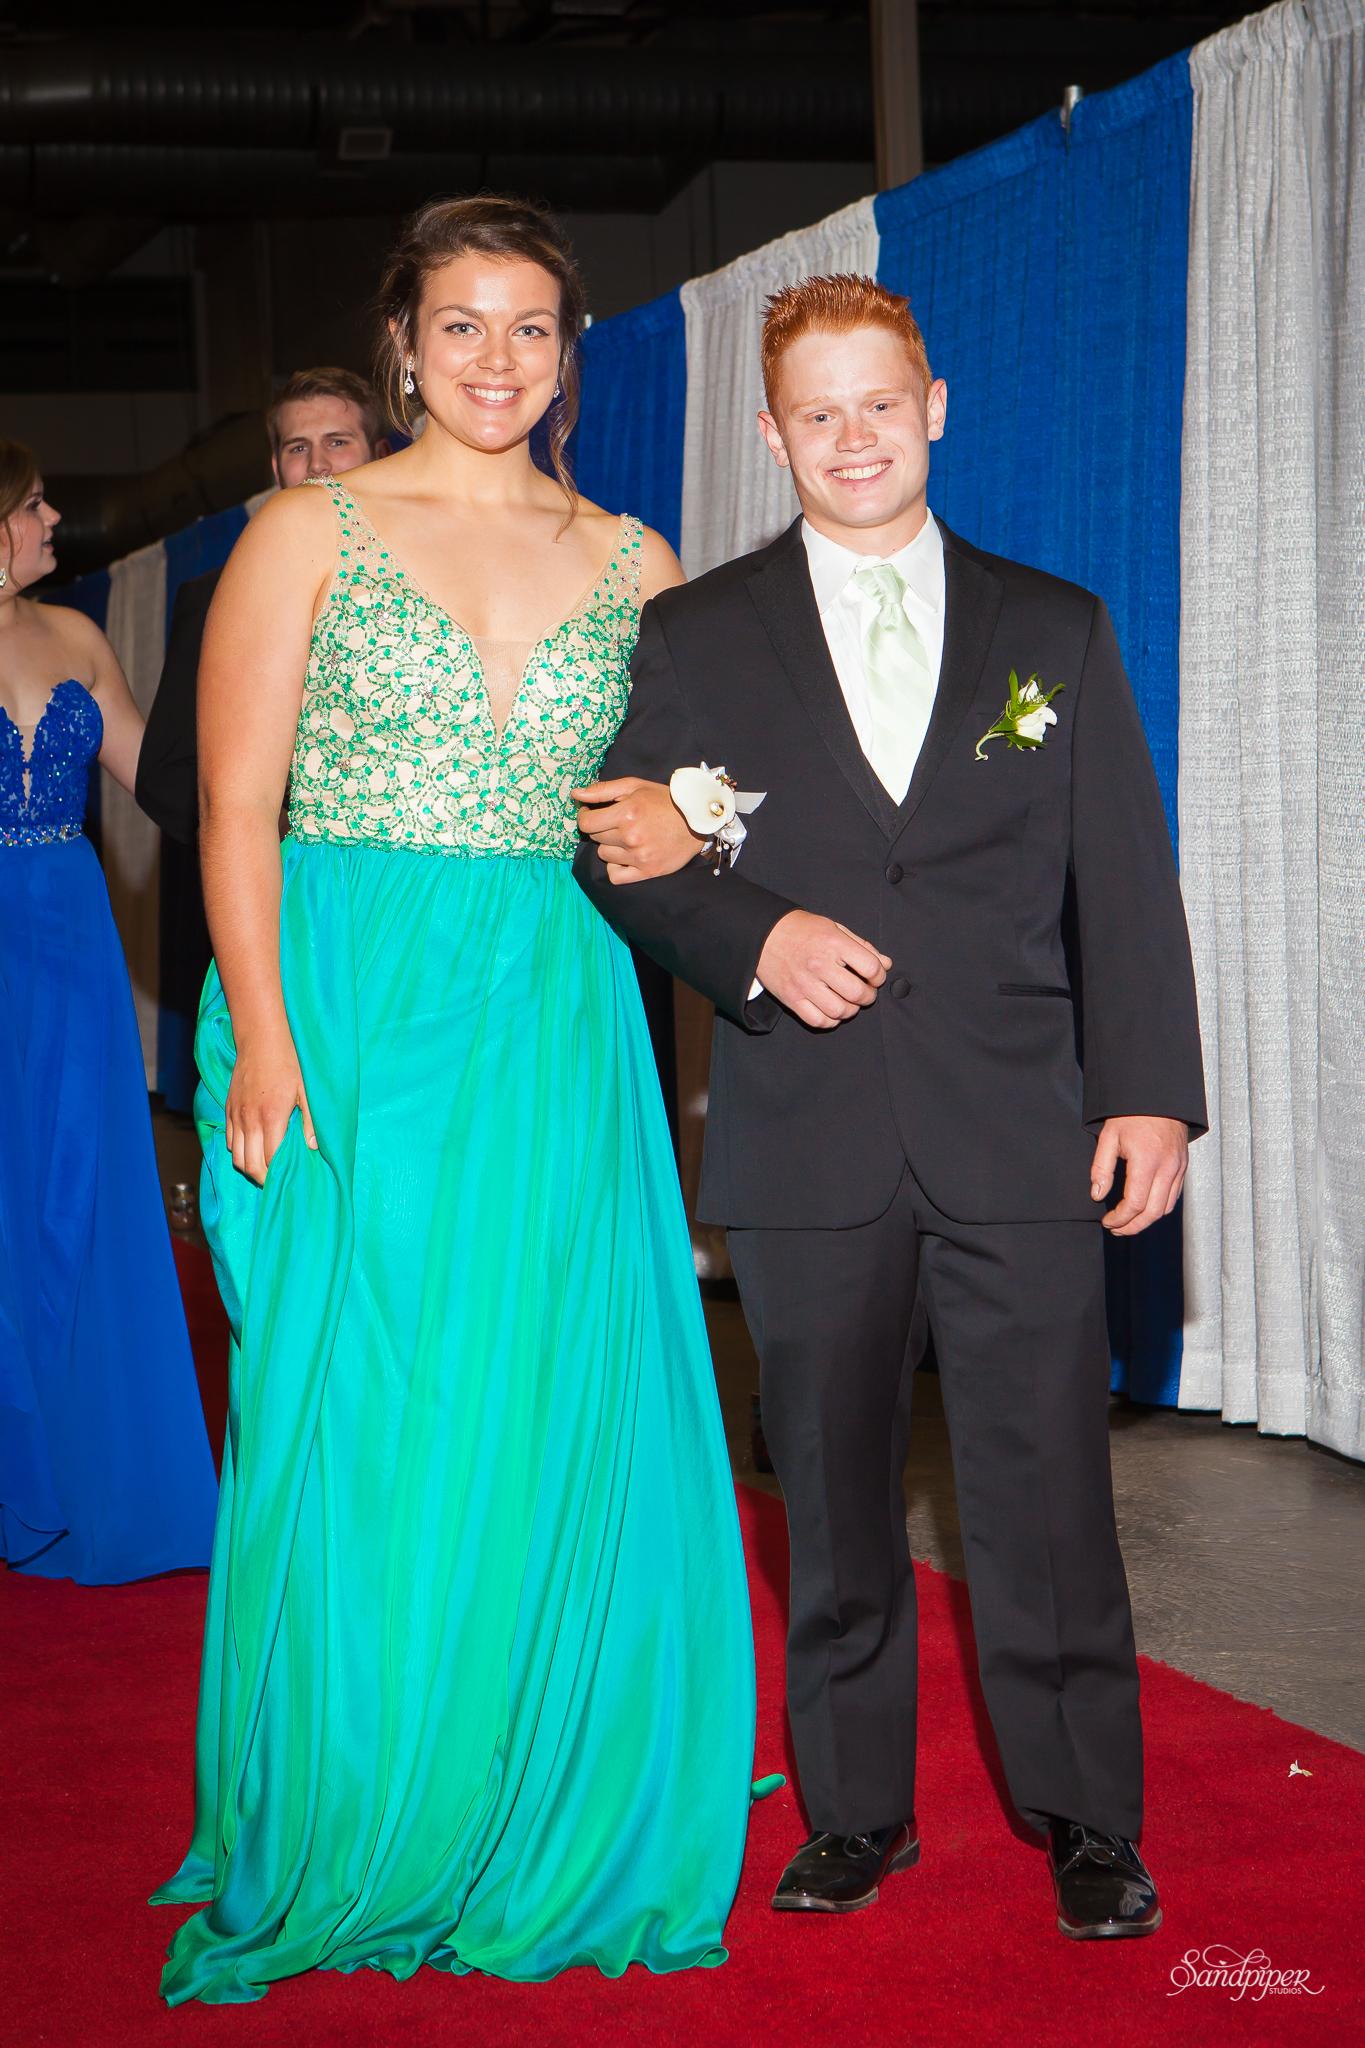 Bluefield Prom 2017 32